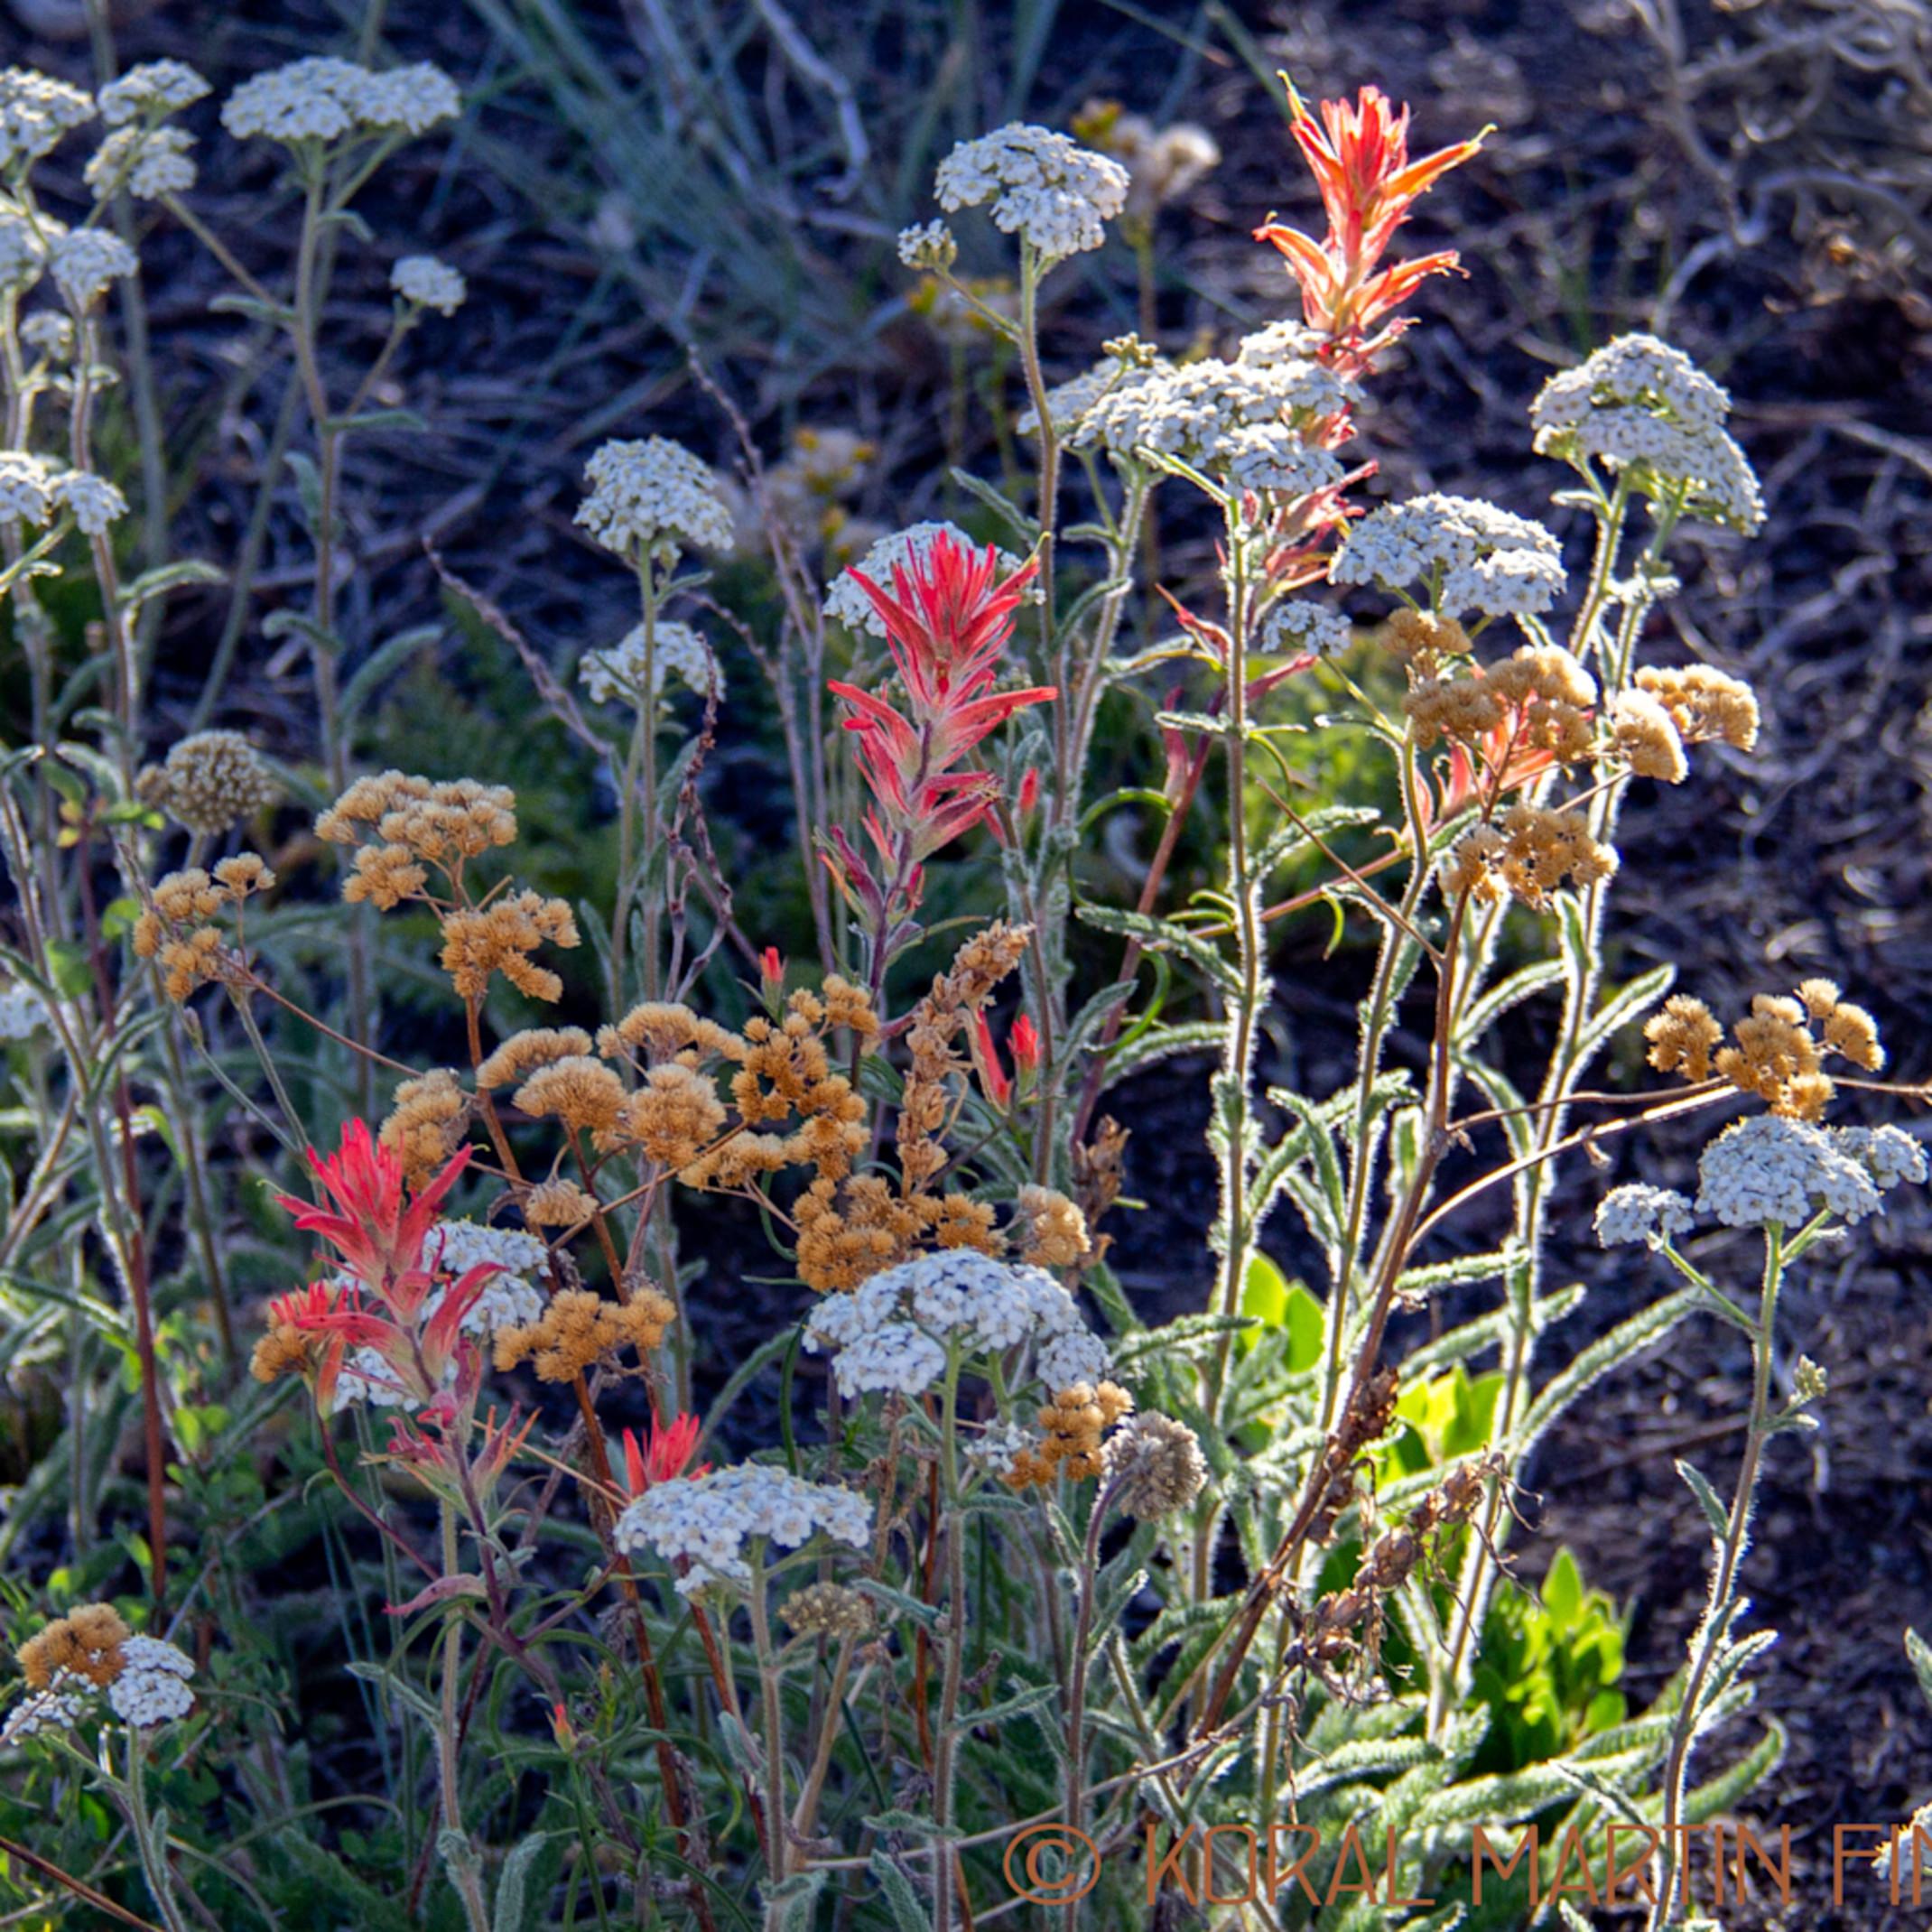 Brycewildflowers 4869 koralmartin rv9wmu